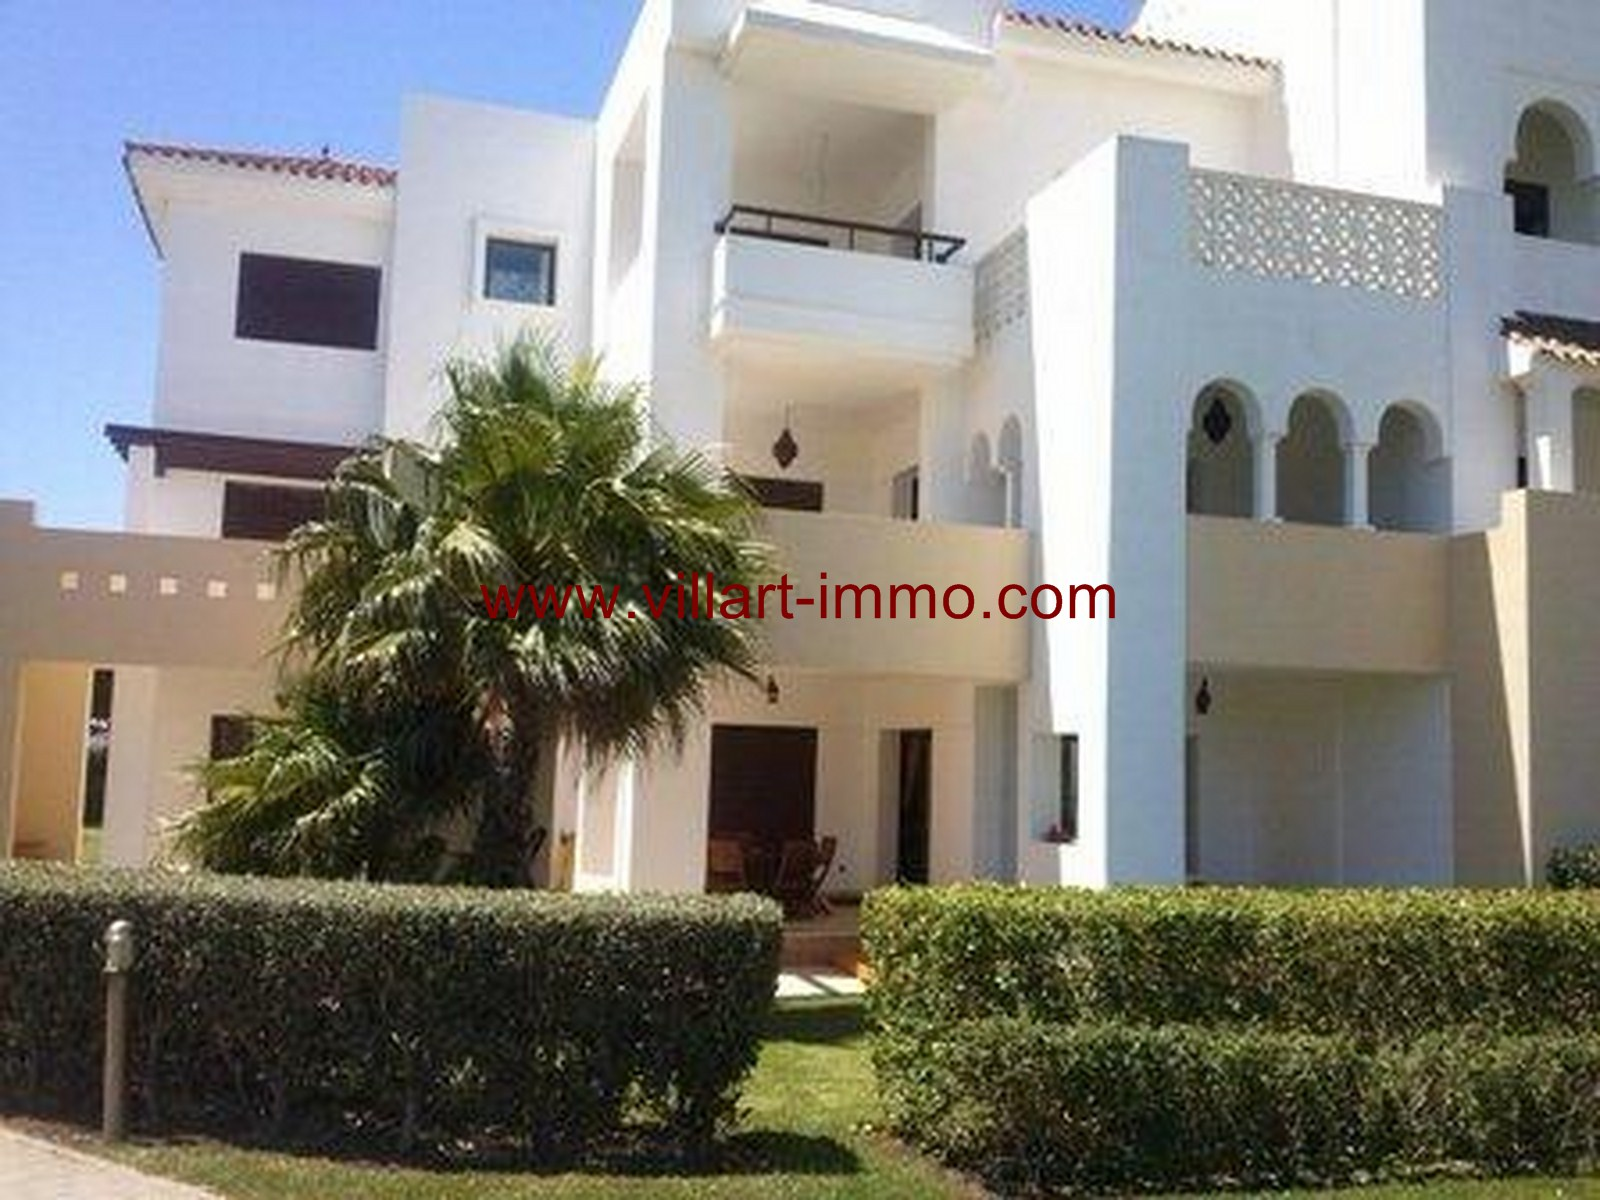 1-vente-appartement-tanger-achakar-facade-va388-villart-immo